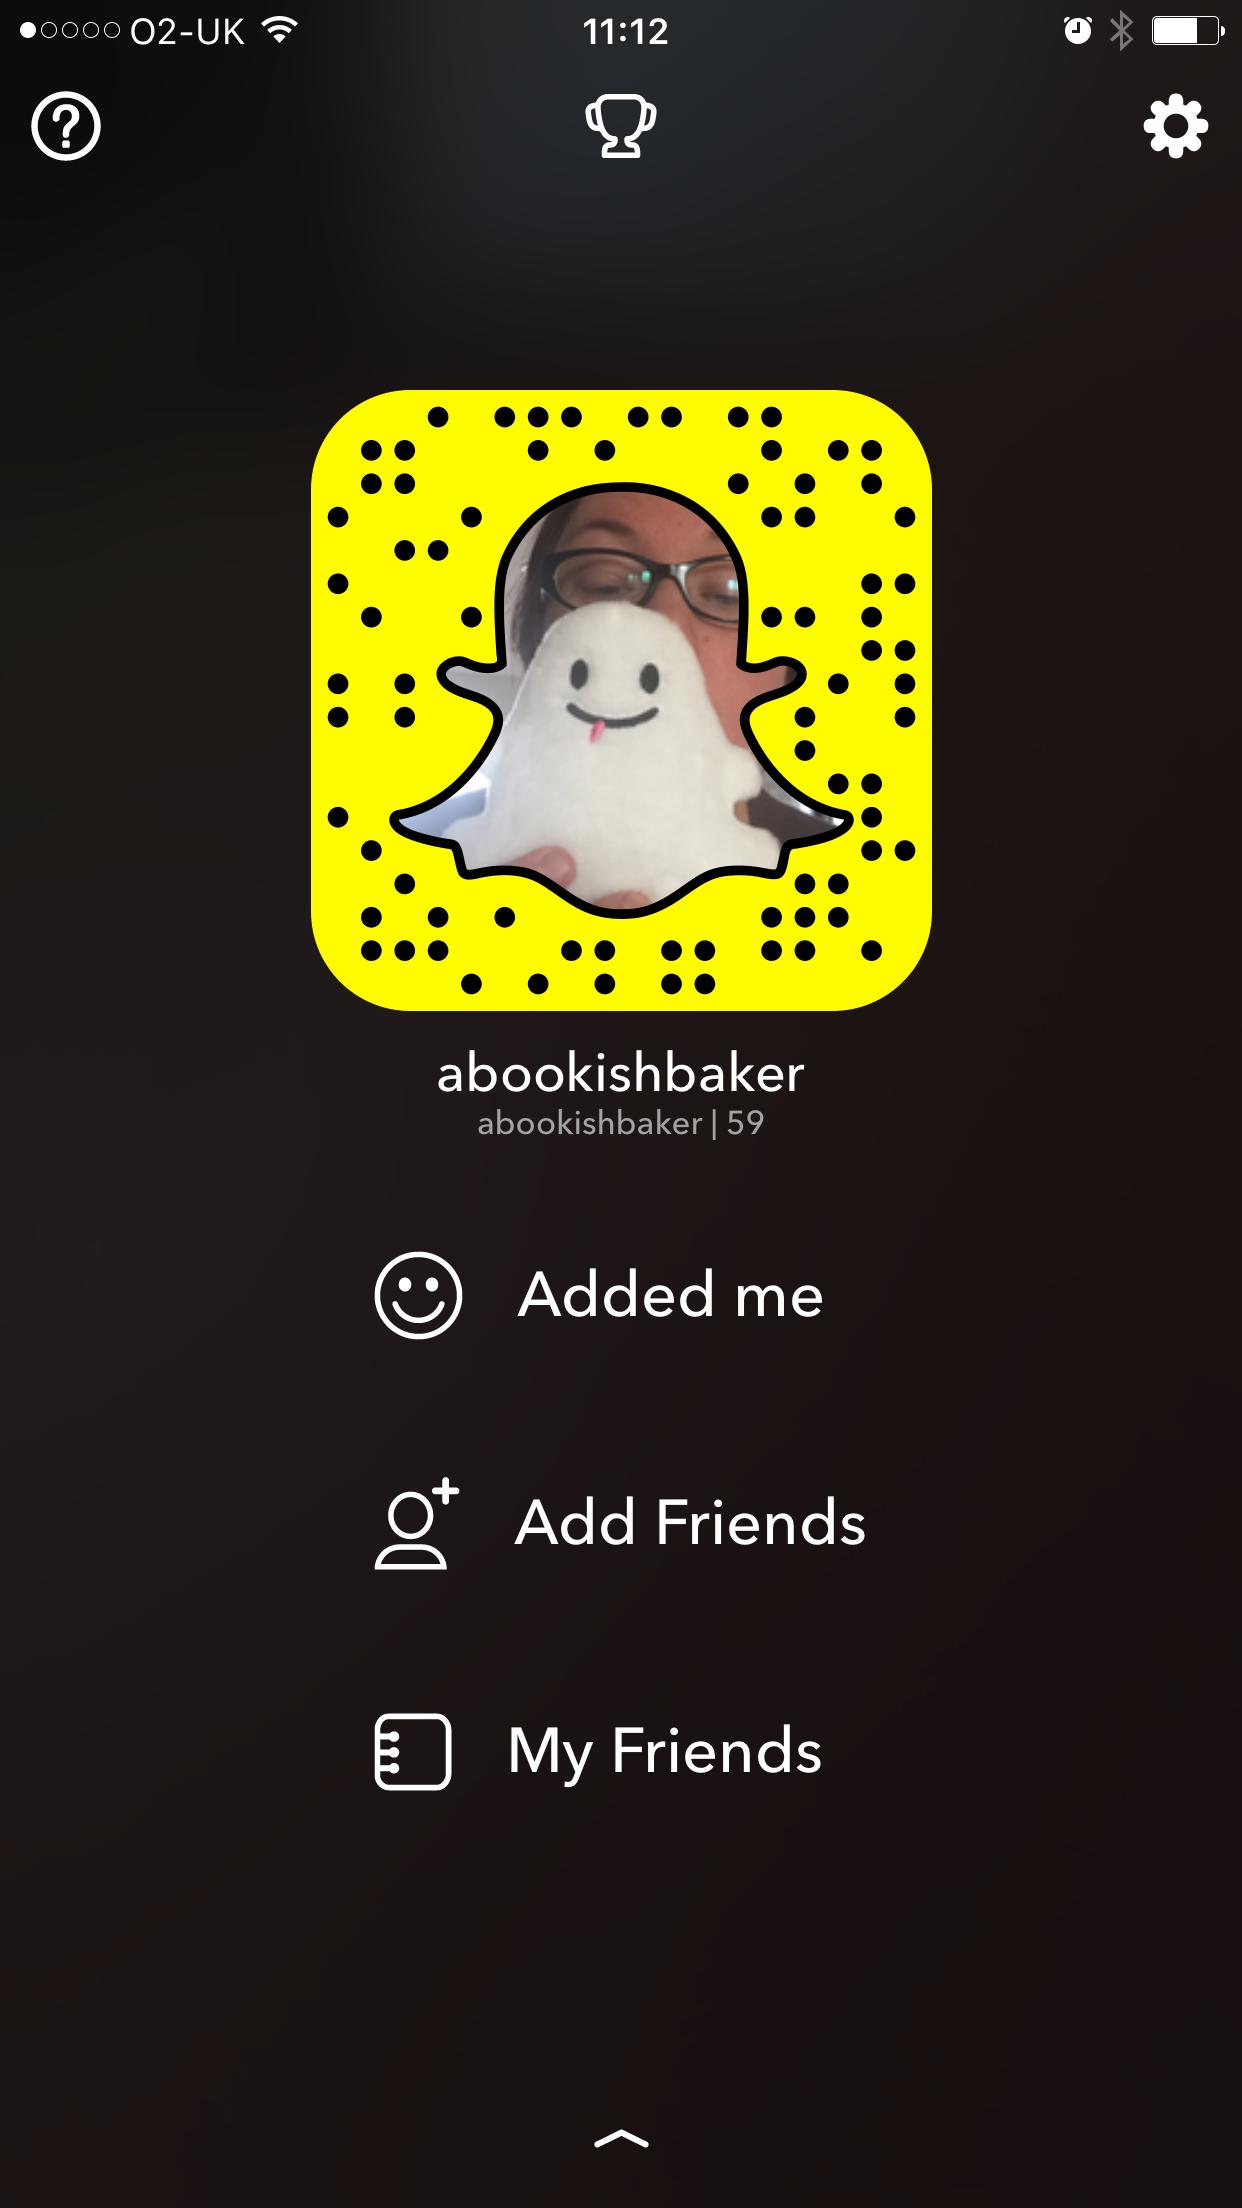 a bookishbaker snapcode